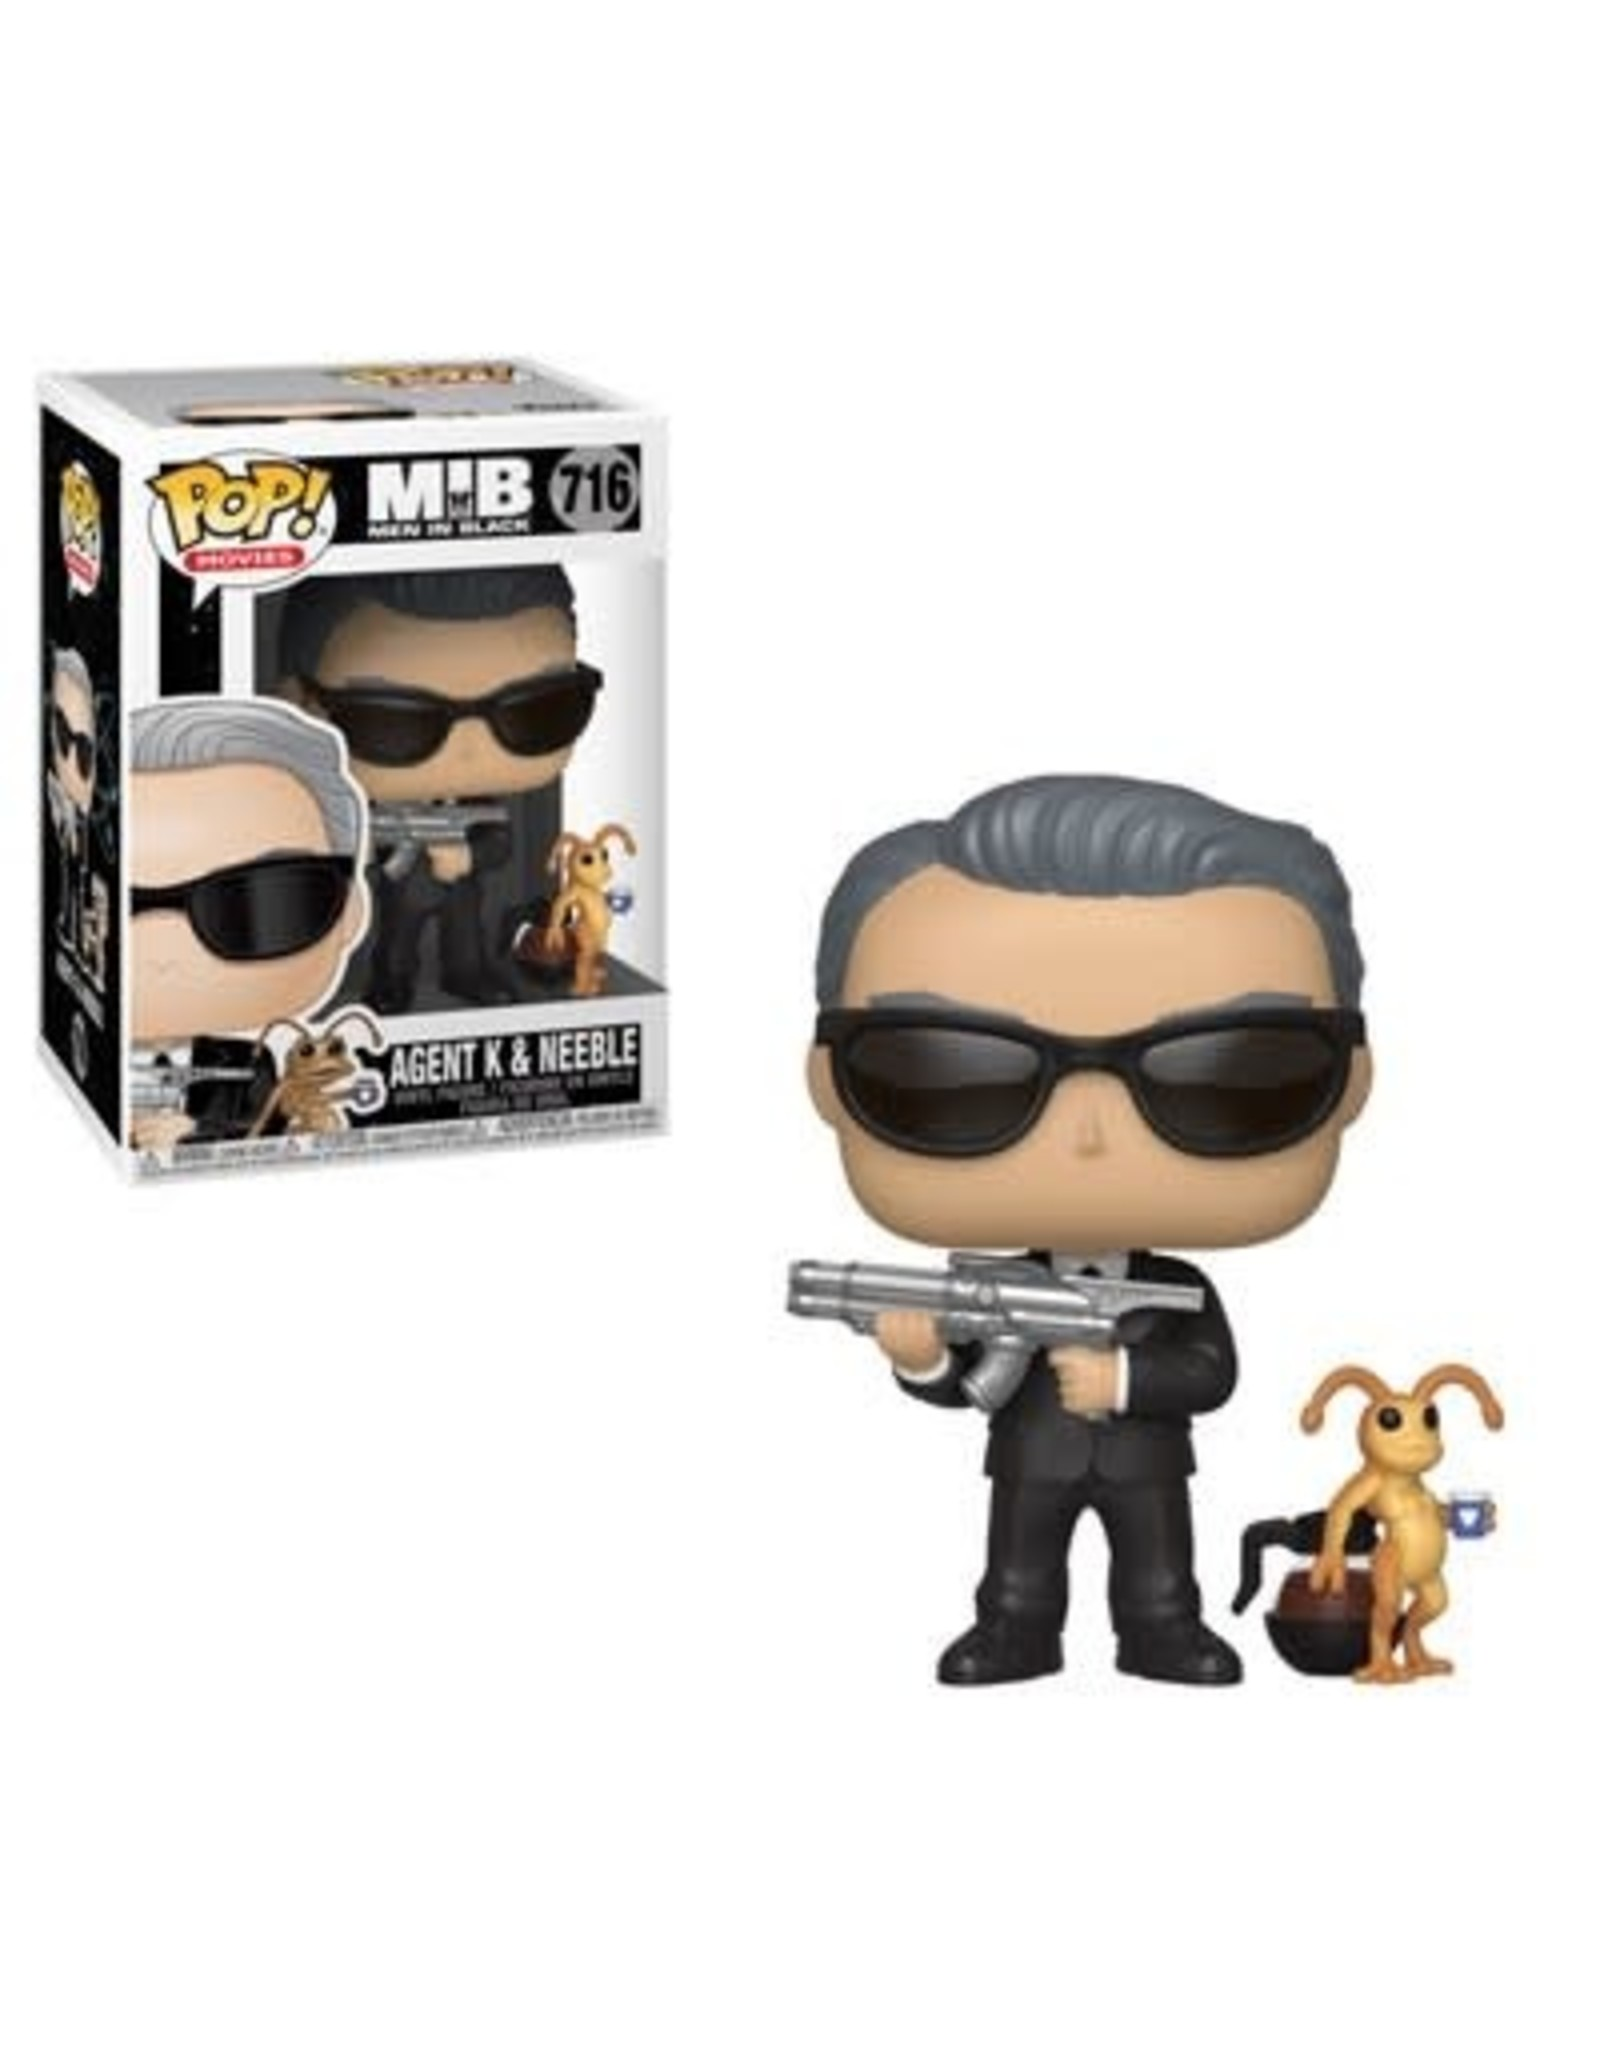 Funko Pop! Funko Pop! Movies nr716 Men in Black - Agent K and Neeble